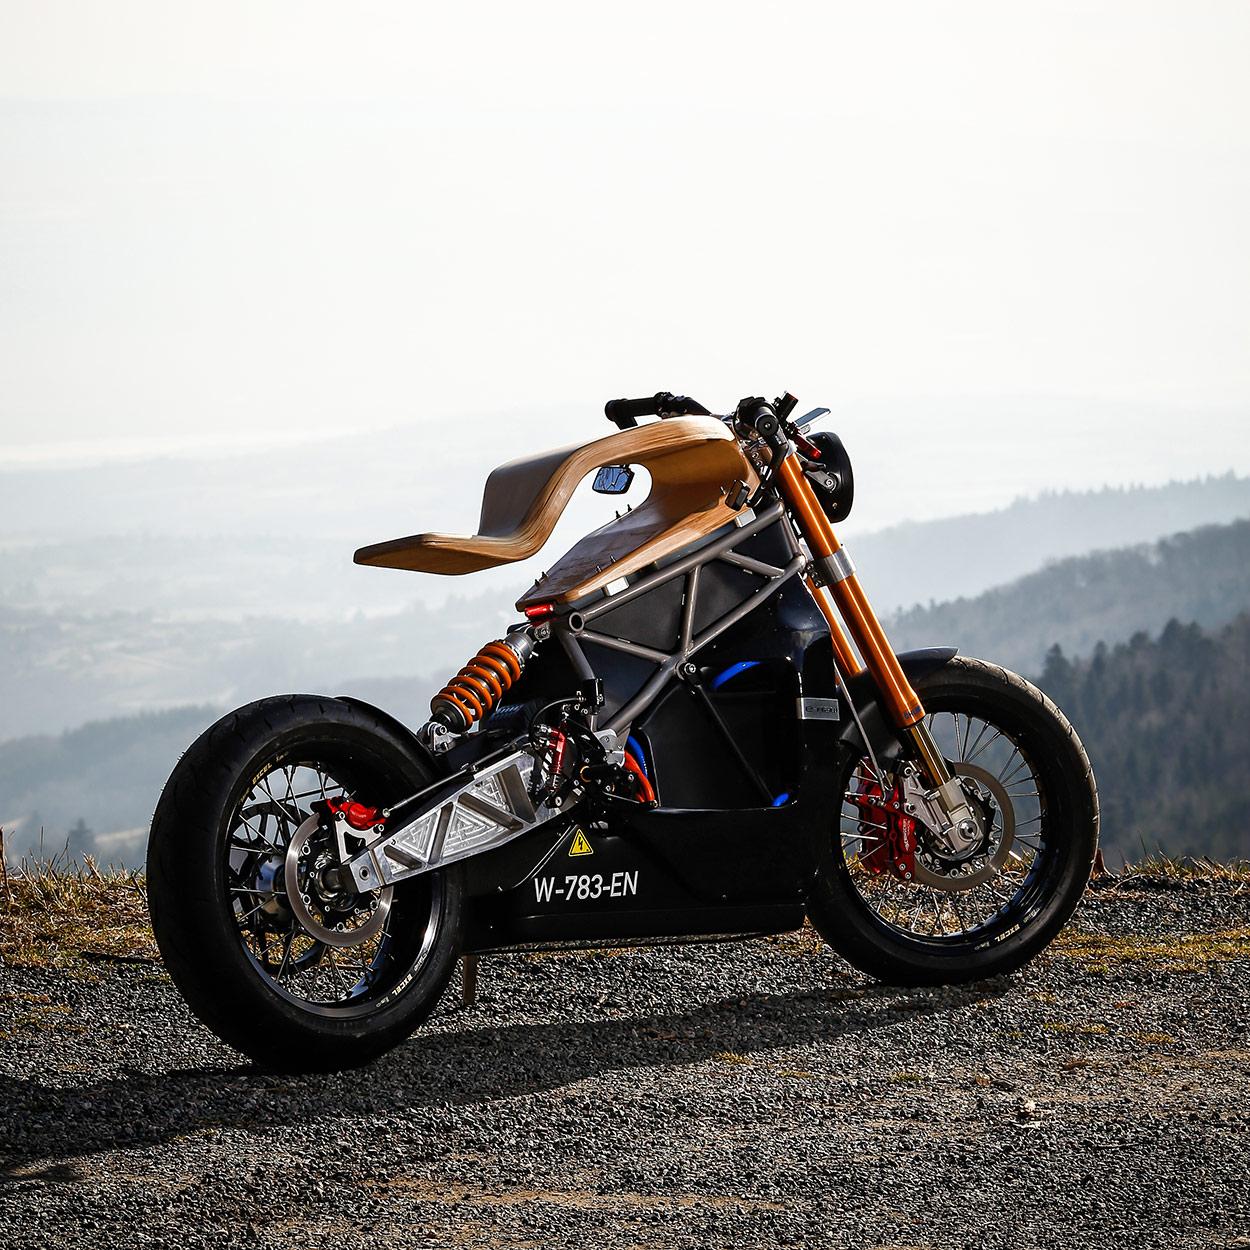 http://kickstart.bikeexif.com/wp-content/uploads/2017/03/e-raw-french-electric-motorcycle-7.jpg